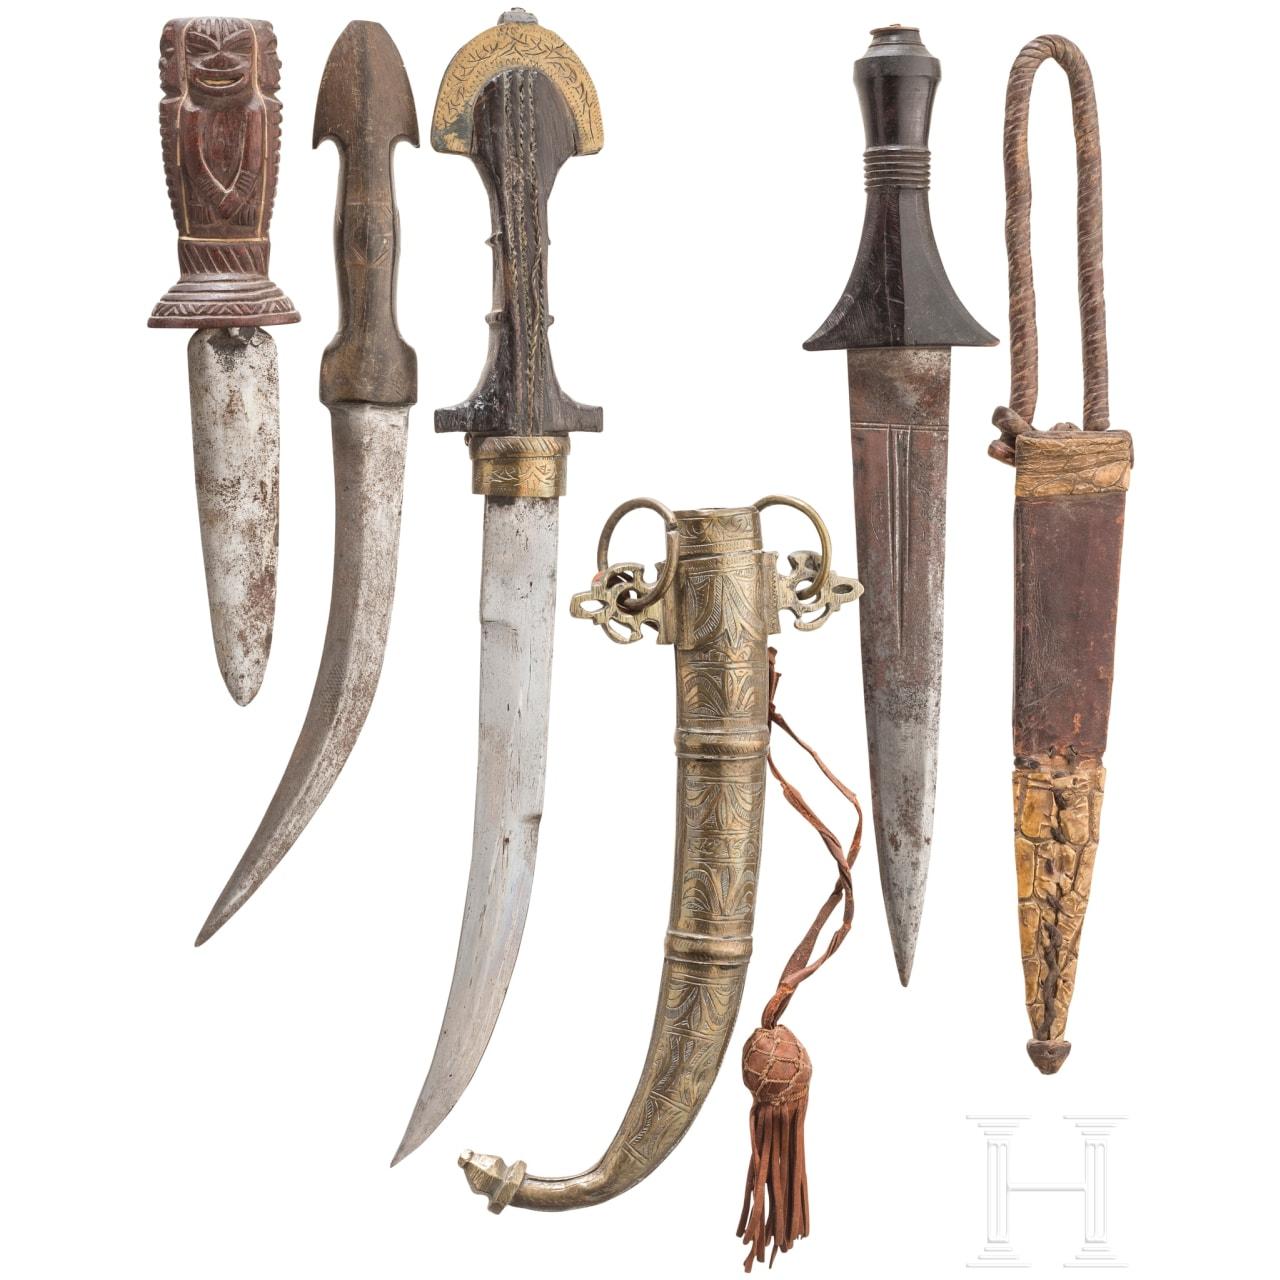 Four daggers, Maghreb, 20th century